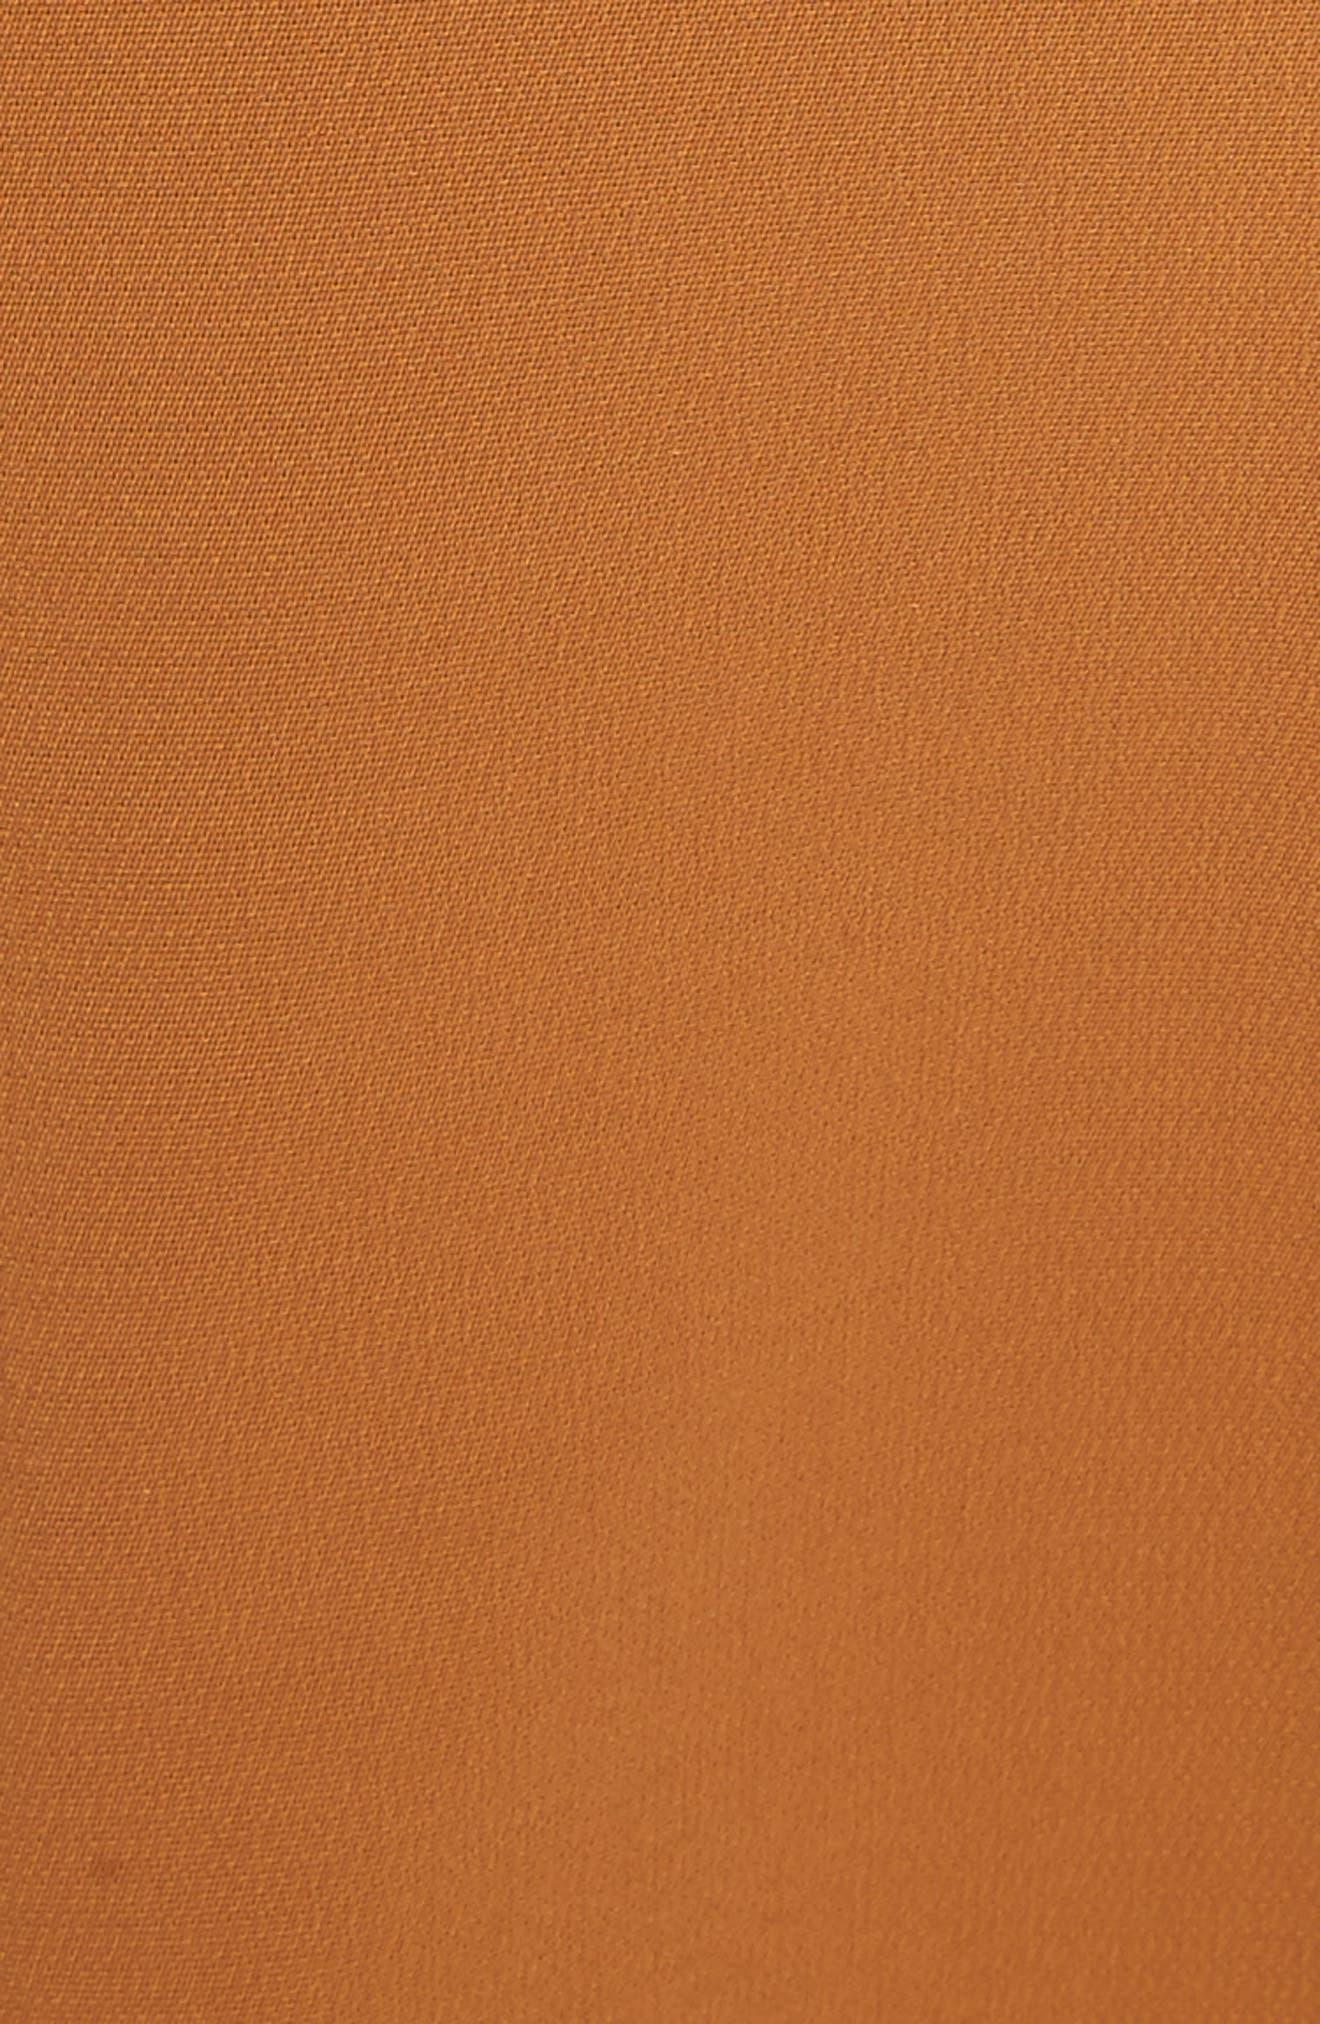 Sander Buckle Strap Midi Dress,                             Alternate thumbnail 5, color,                             Gold